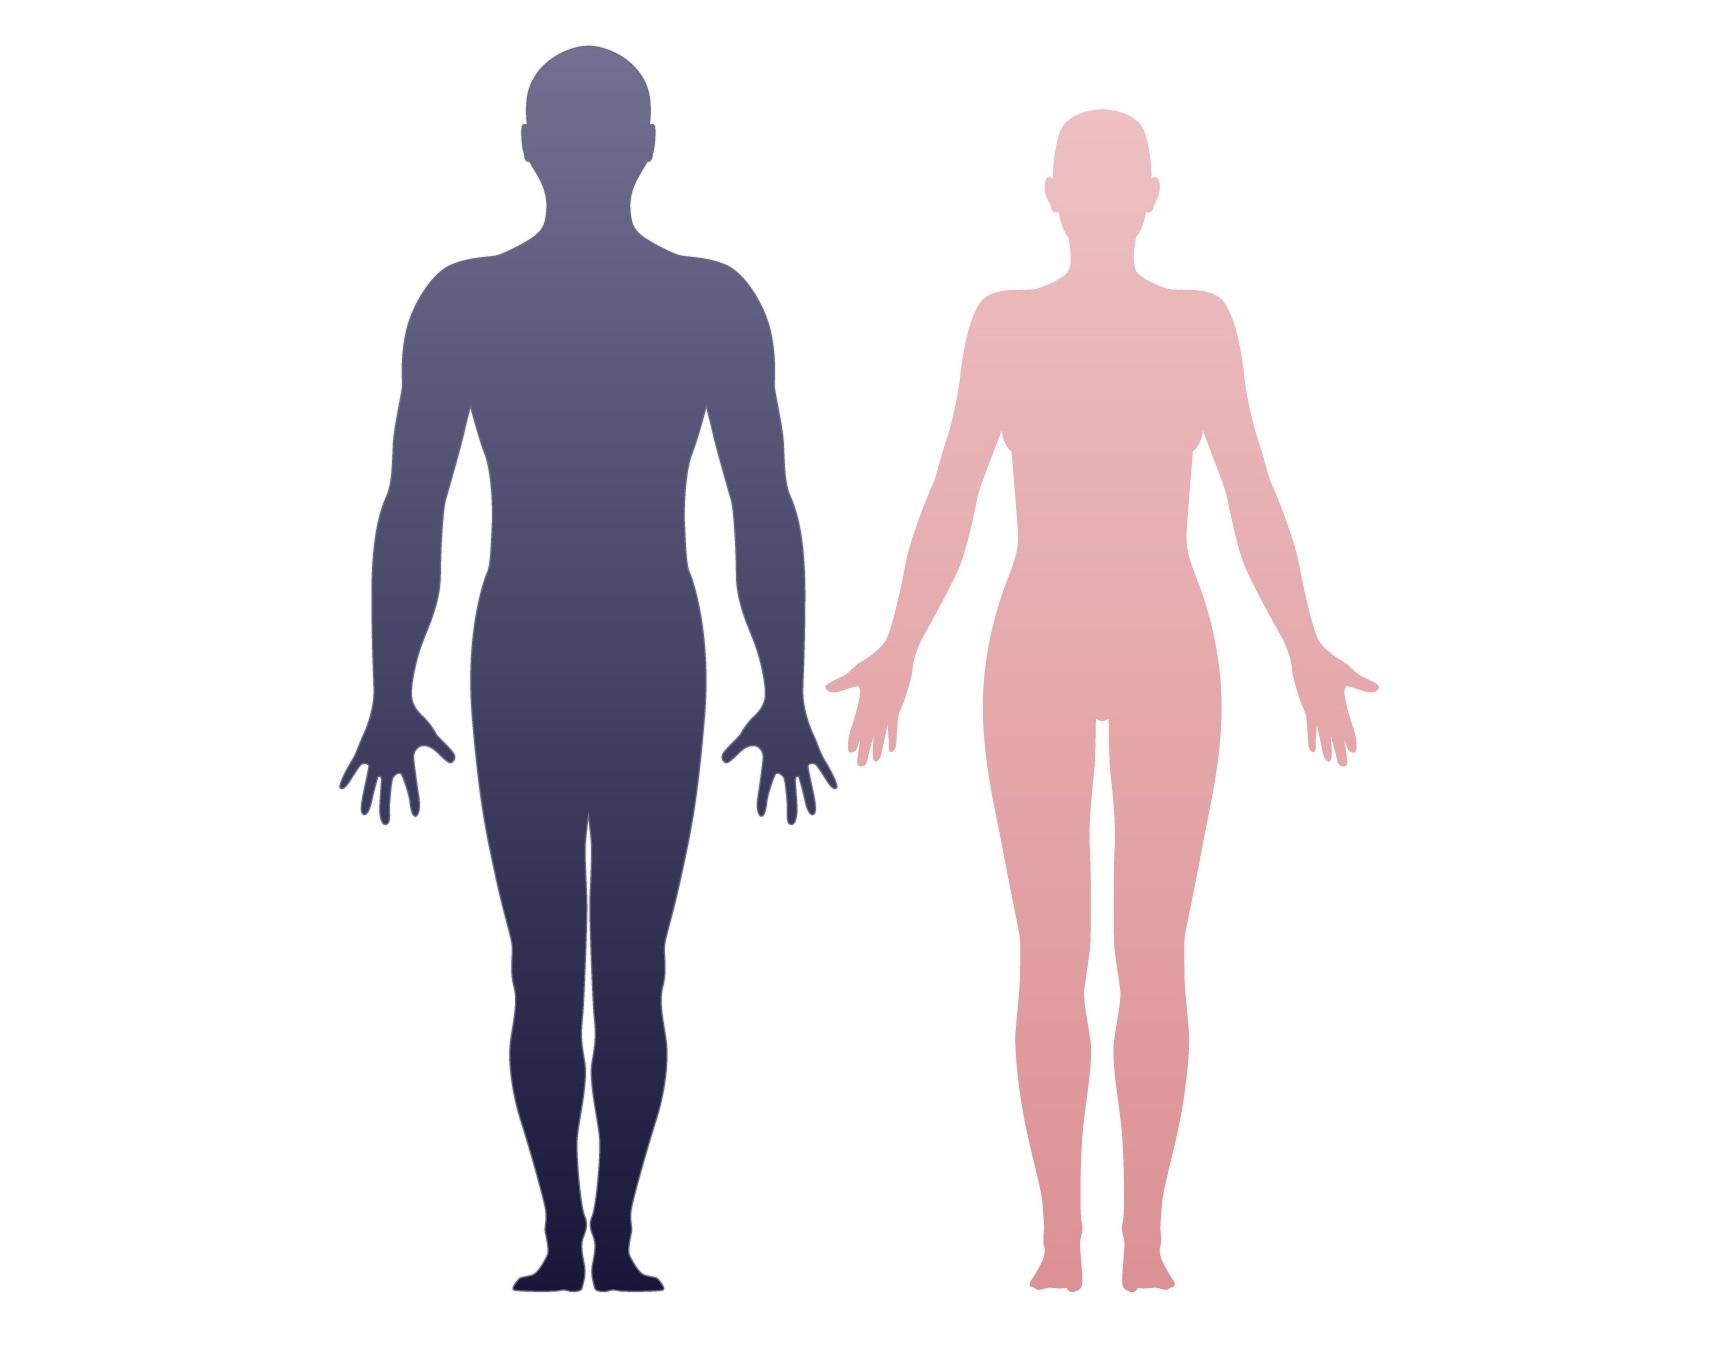 The unfashionable human body 65